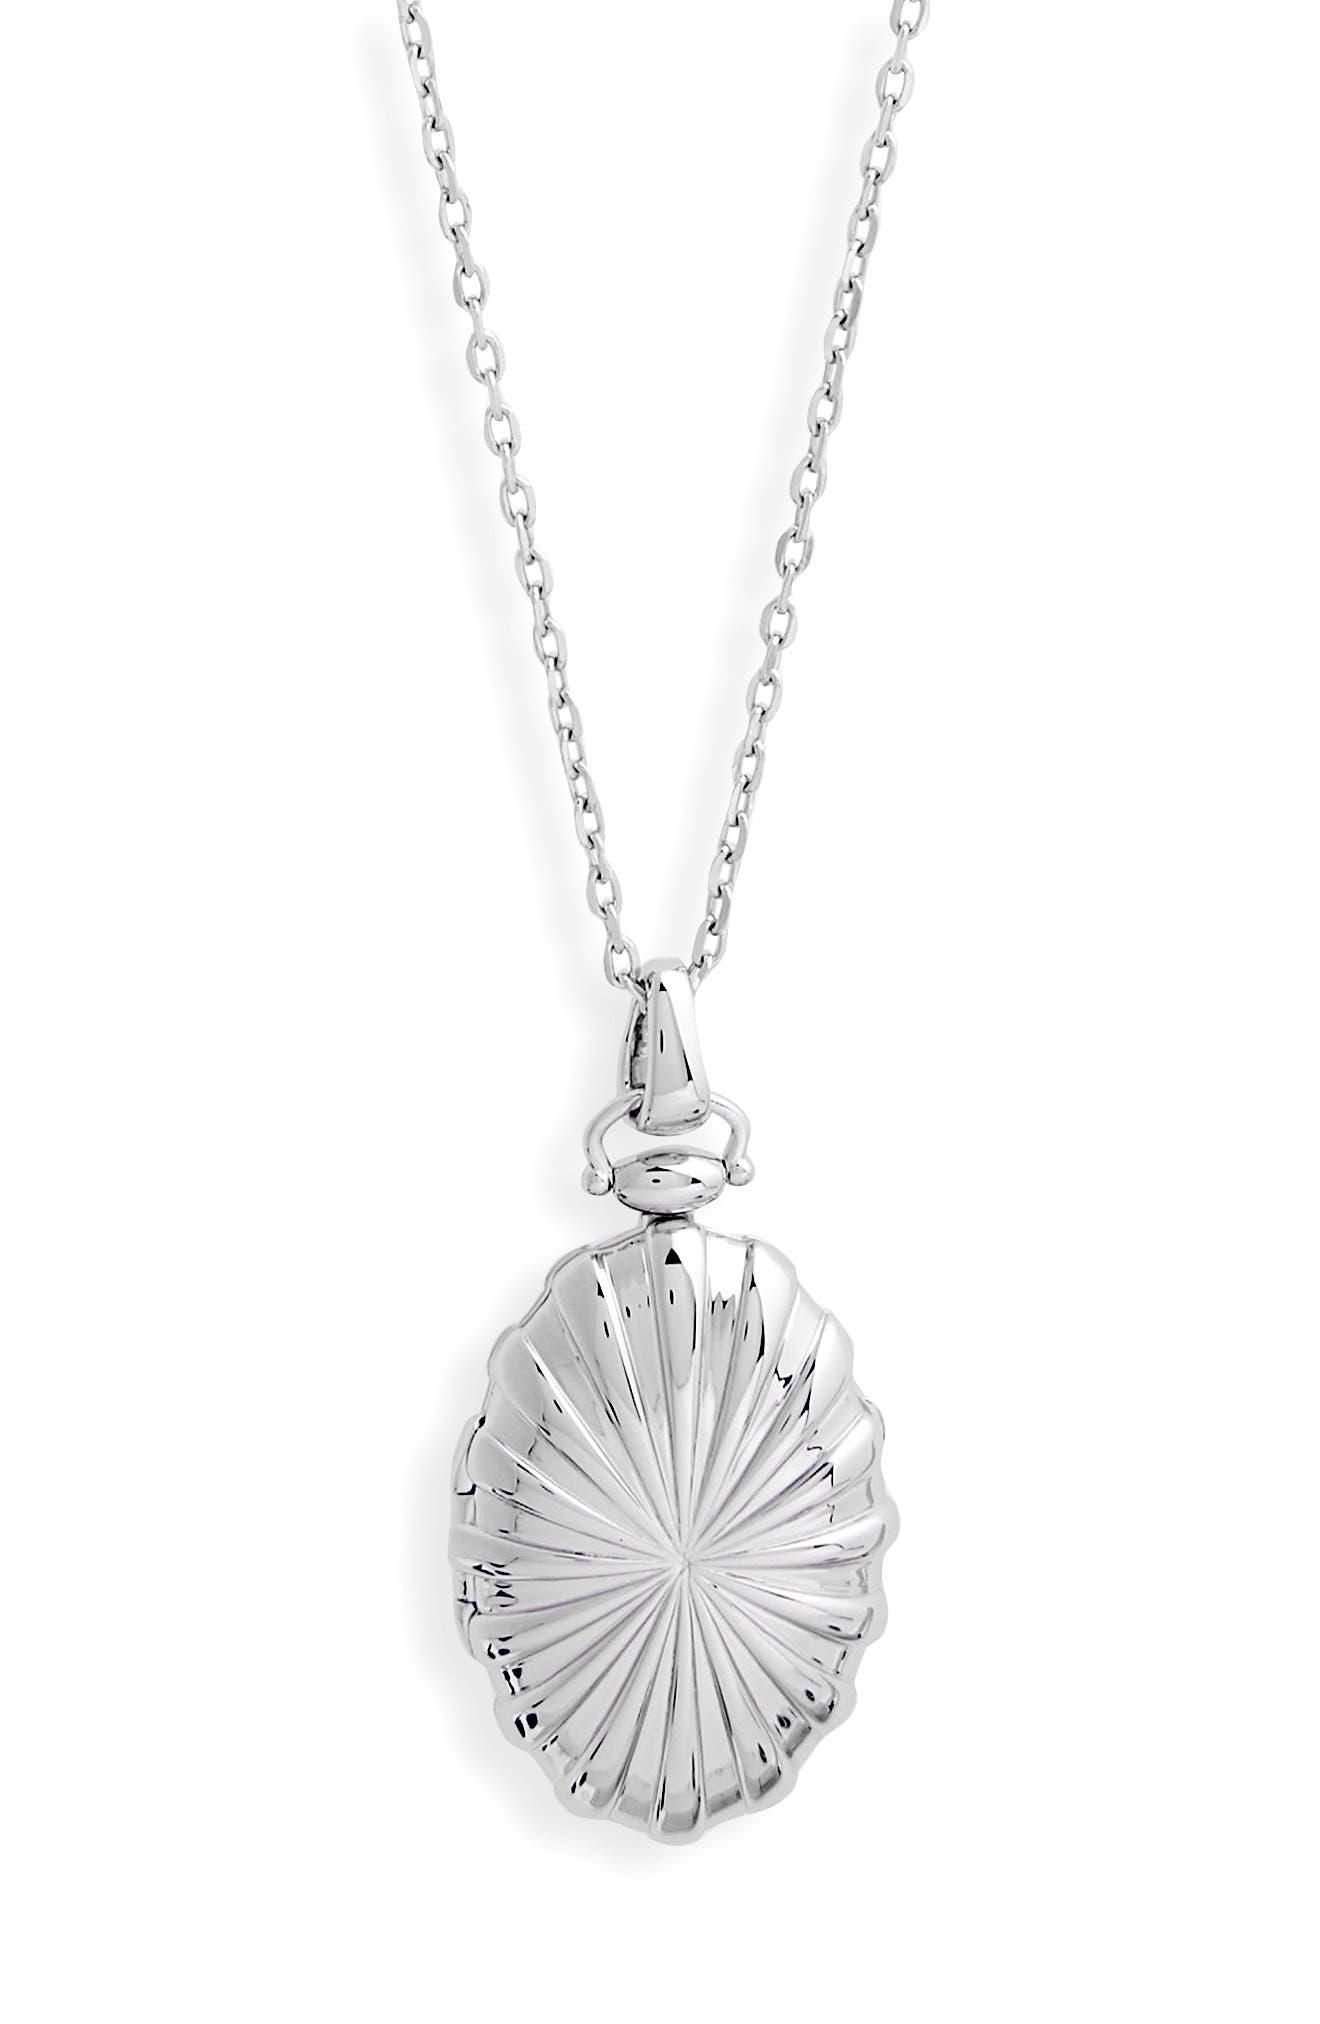 Sunburst Locket Necklace,                             Alternate thumbnail 2, color,                             Sterling Silver